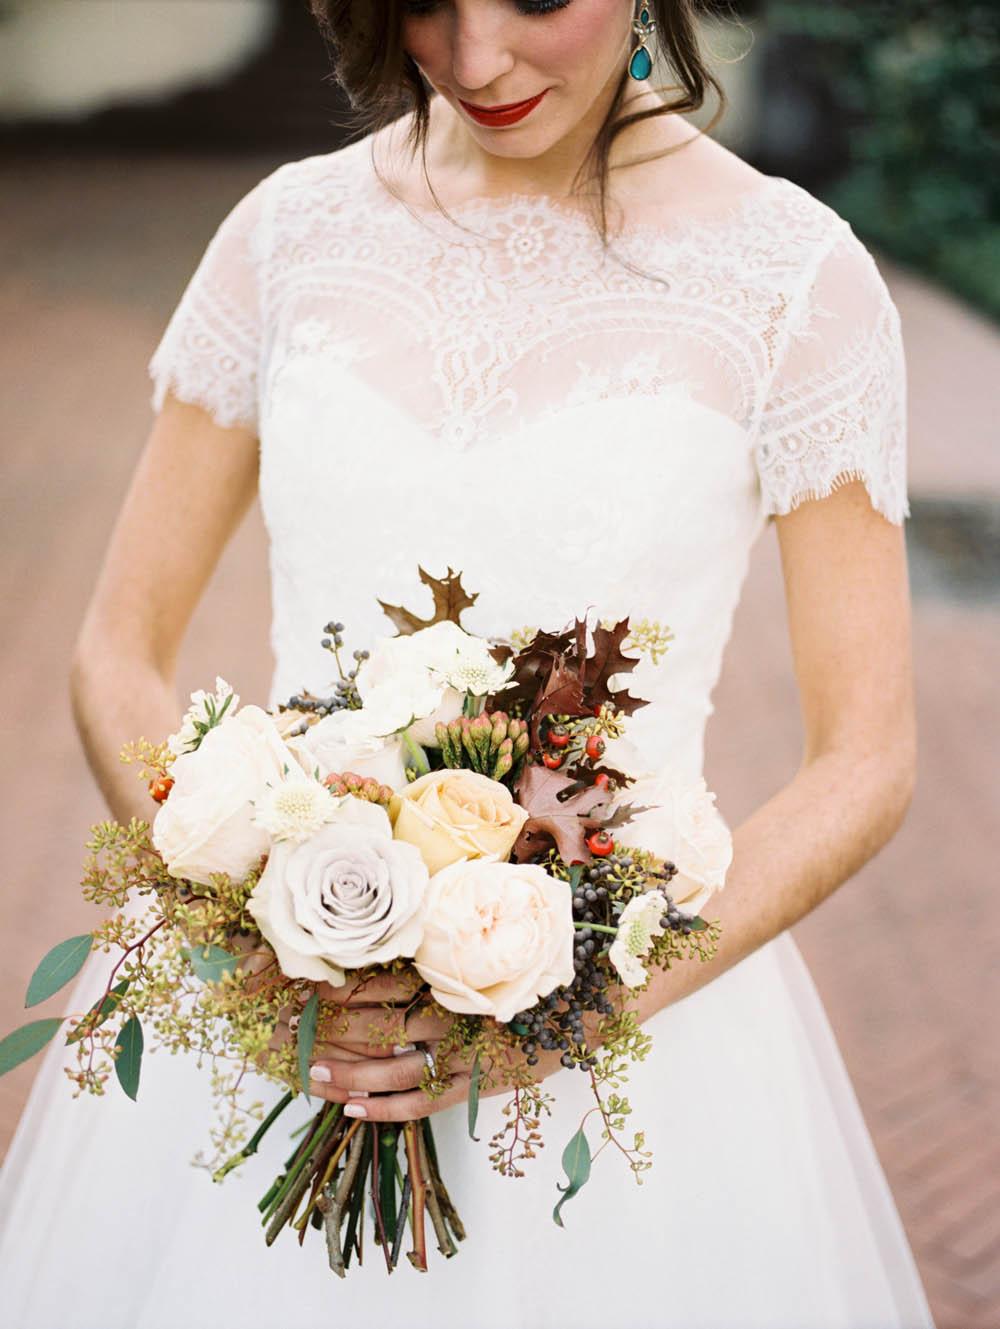 Natural, lush bridal bouquet